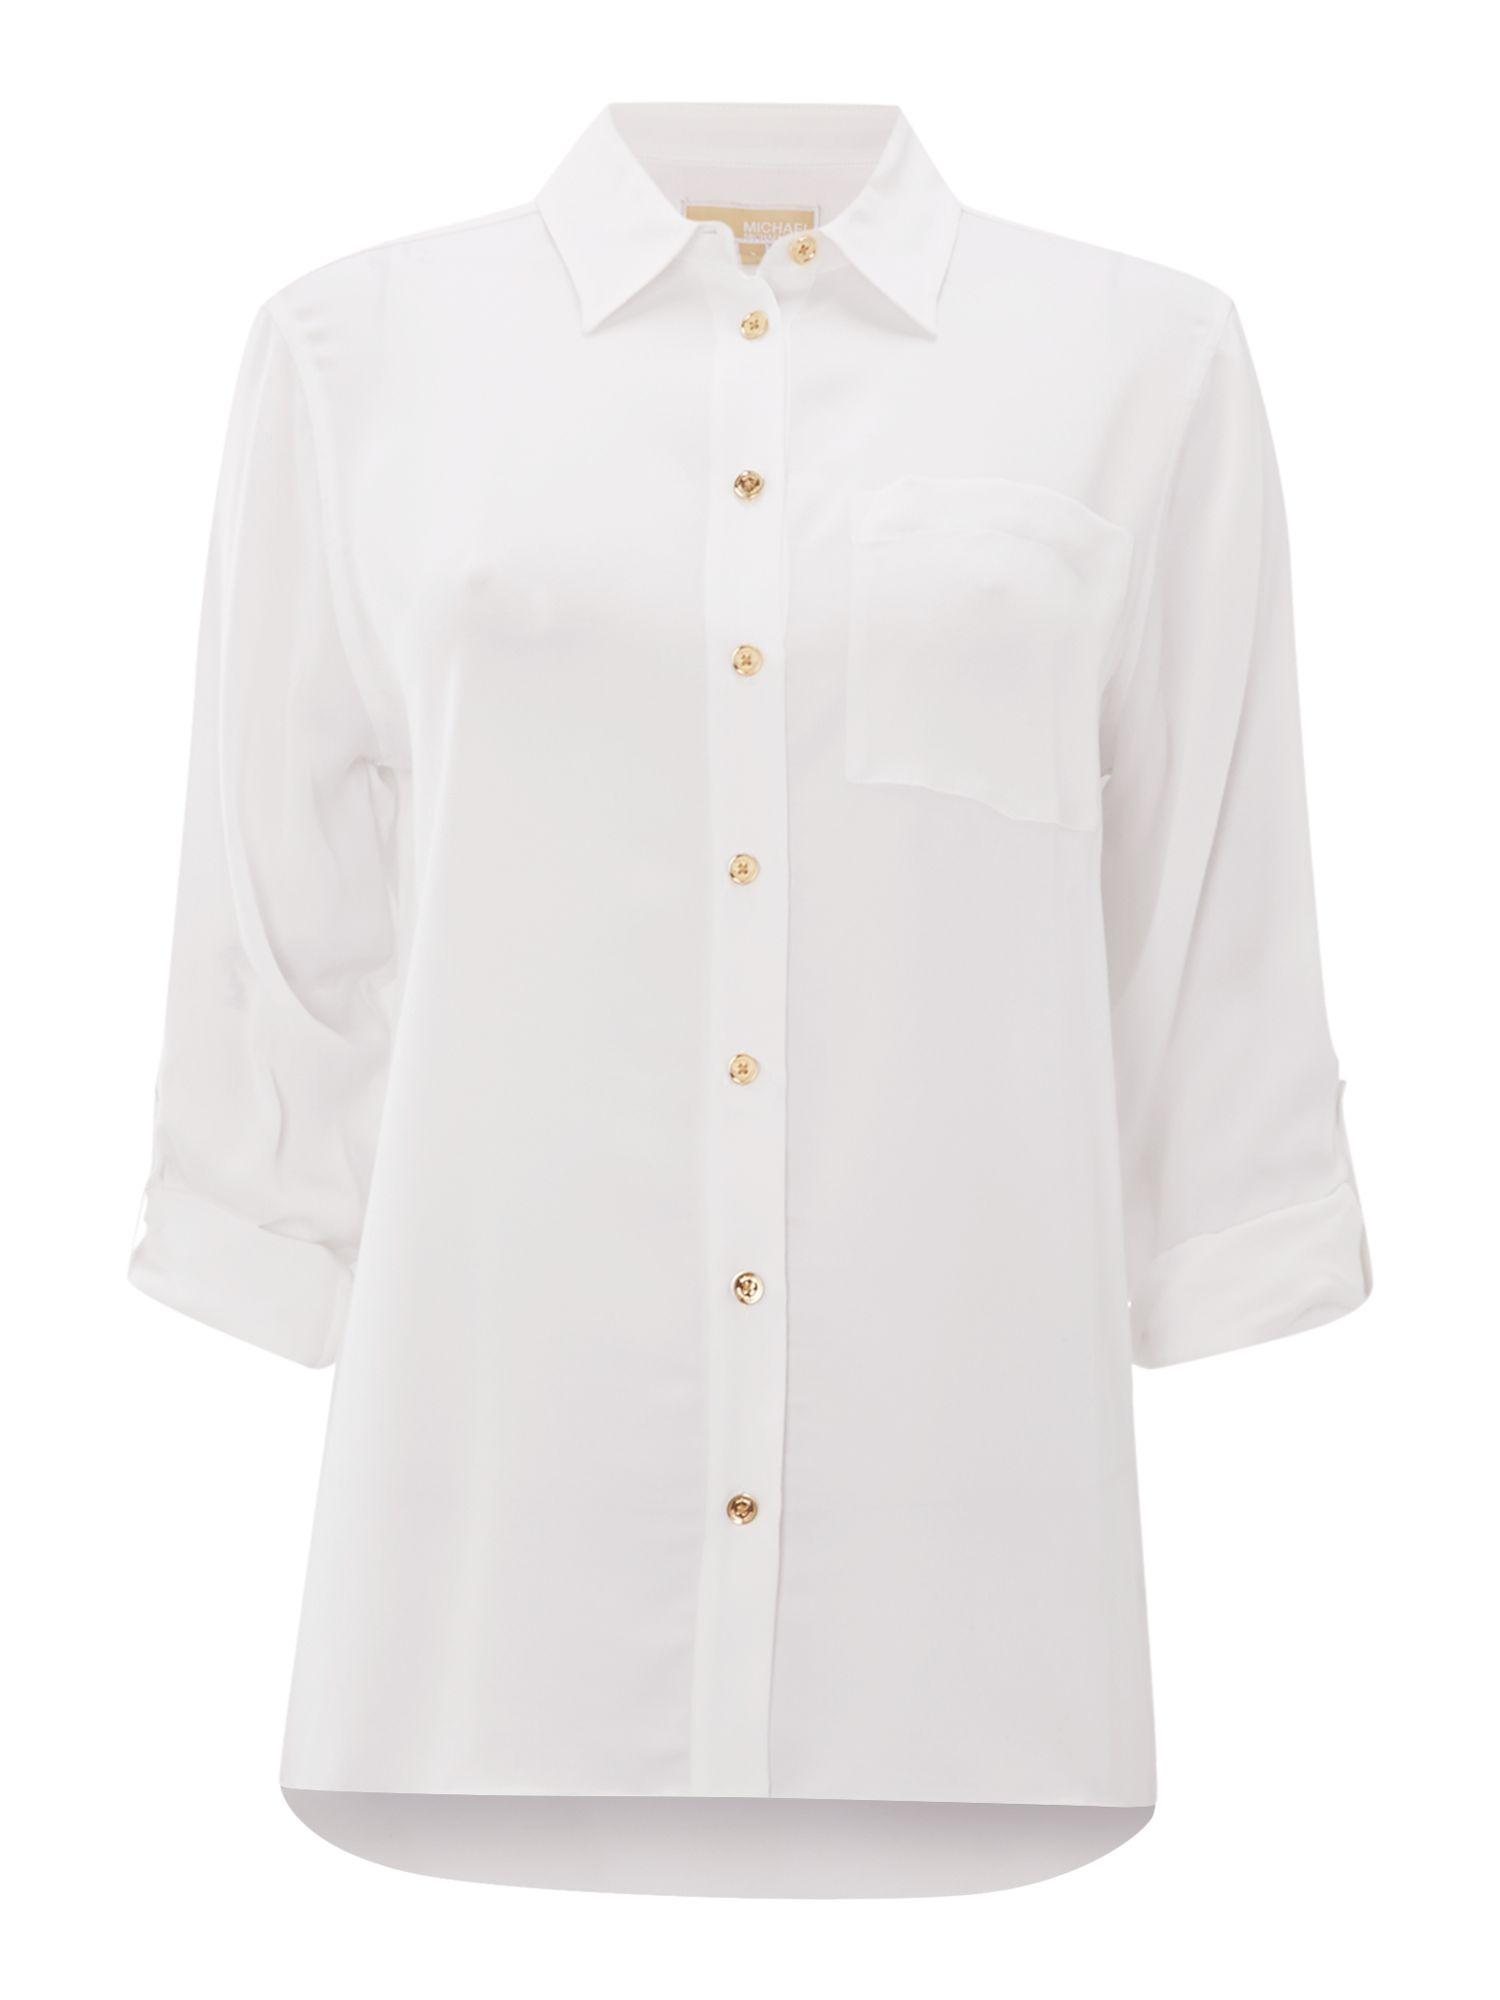 Michael kors hi low button down silk shirt in white lyst for Silk button down shirt